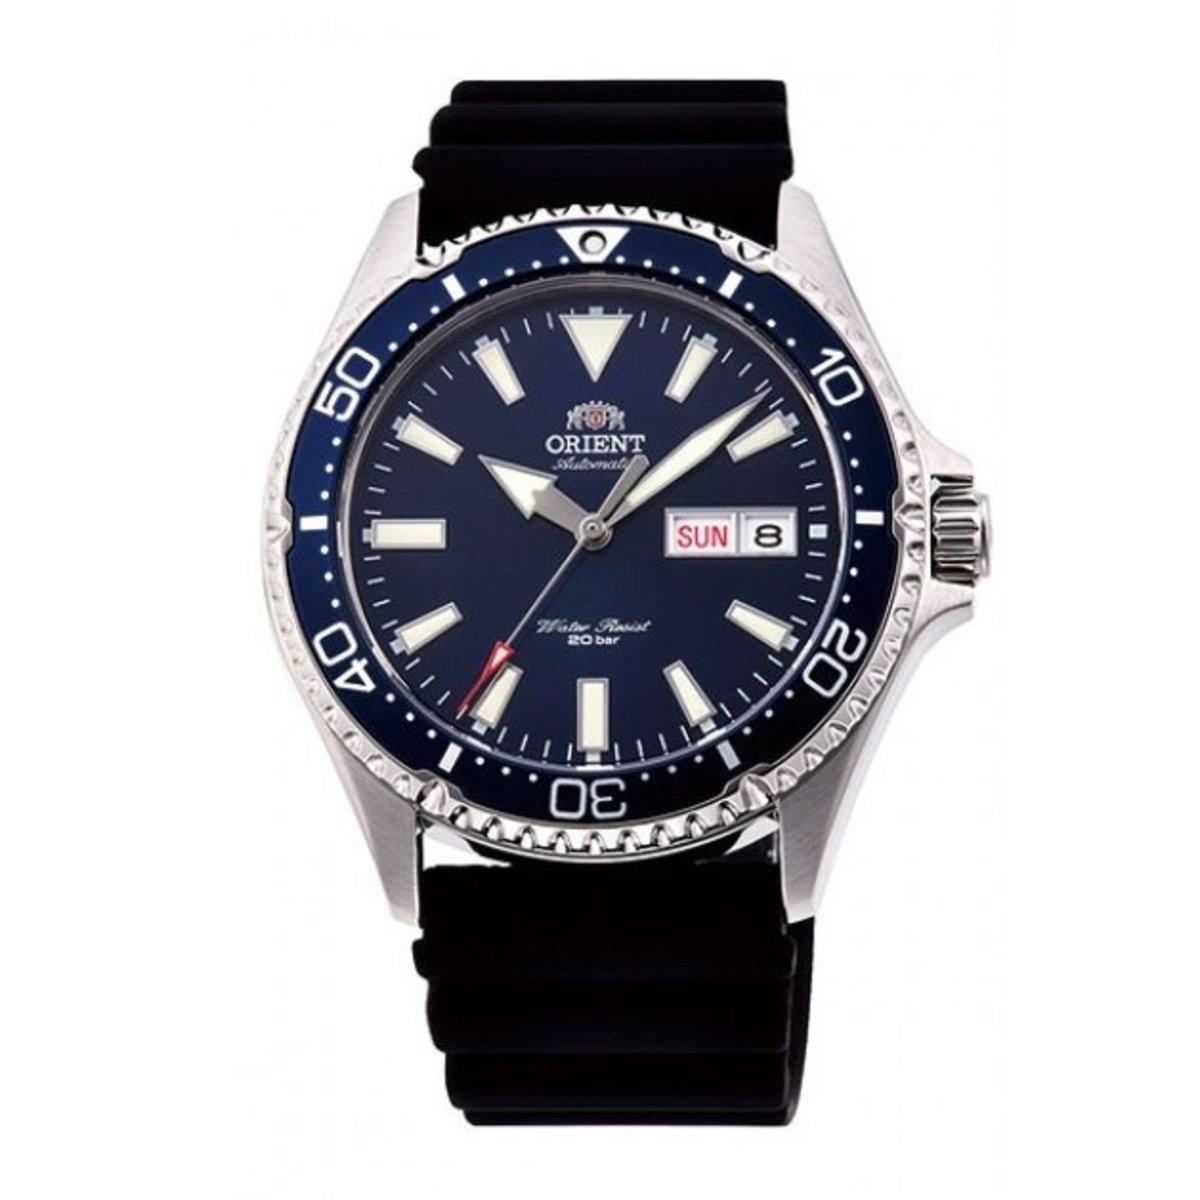 Orient Sport Series Automatic Mechanical Watch RN-AA0004L